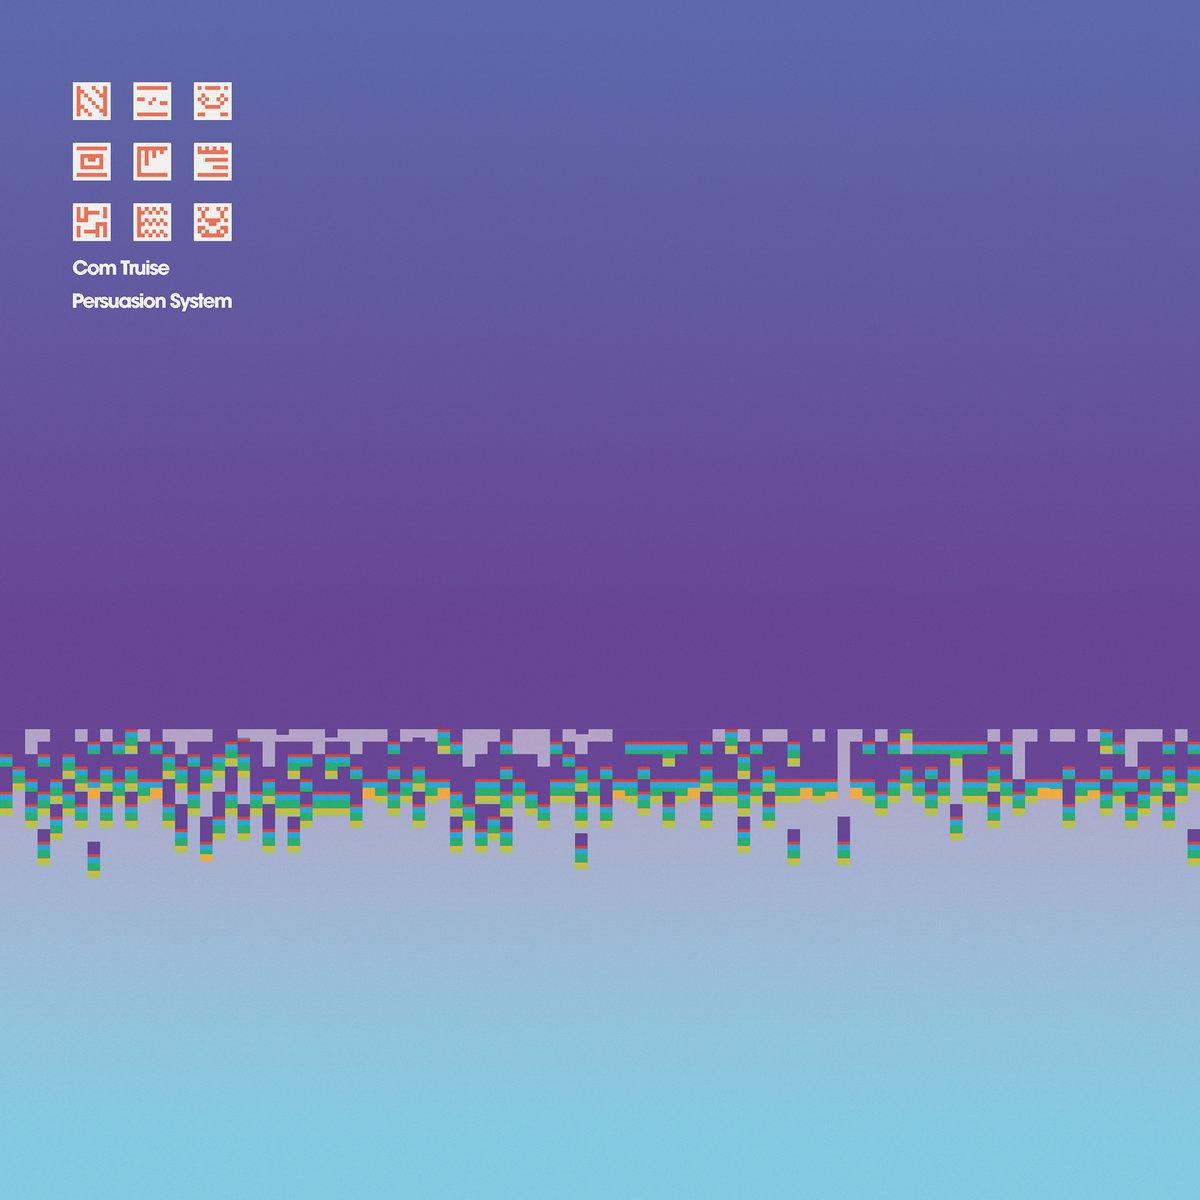 "Com Truise - Persuasion System ""Mini LP"" (May 17th, 2019"